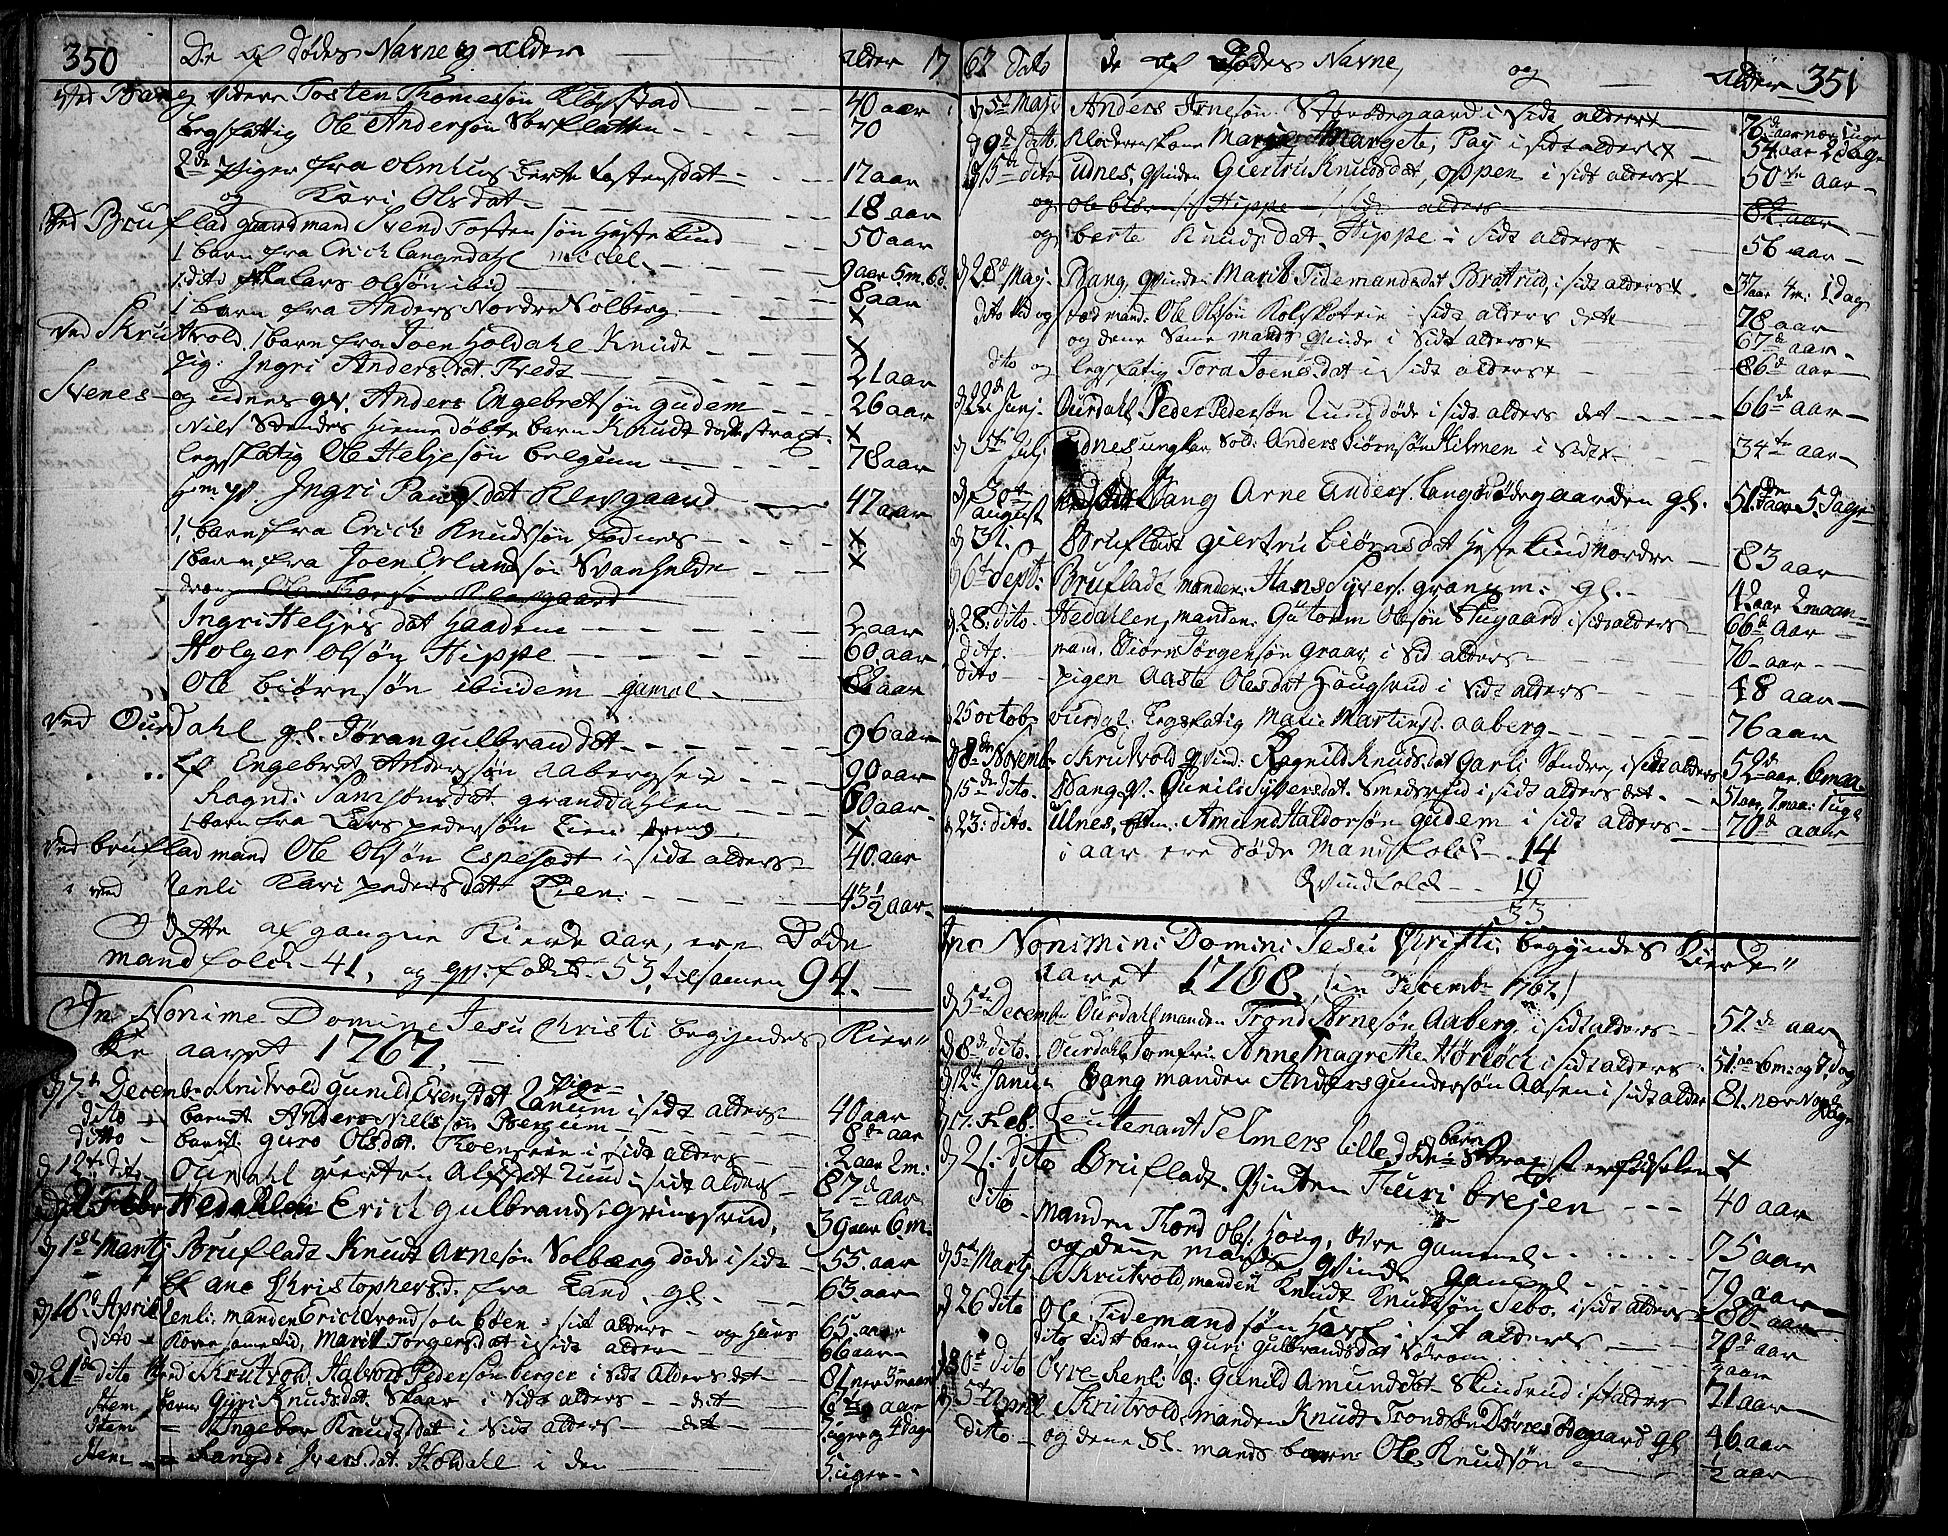 SAH, Aurdal prestekontor, Ministerialbok nr. 5, 1763-1781, s. 350-351